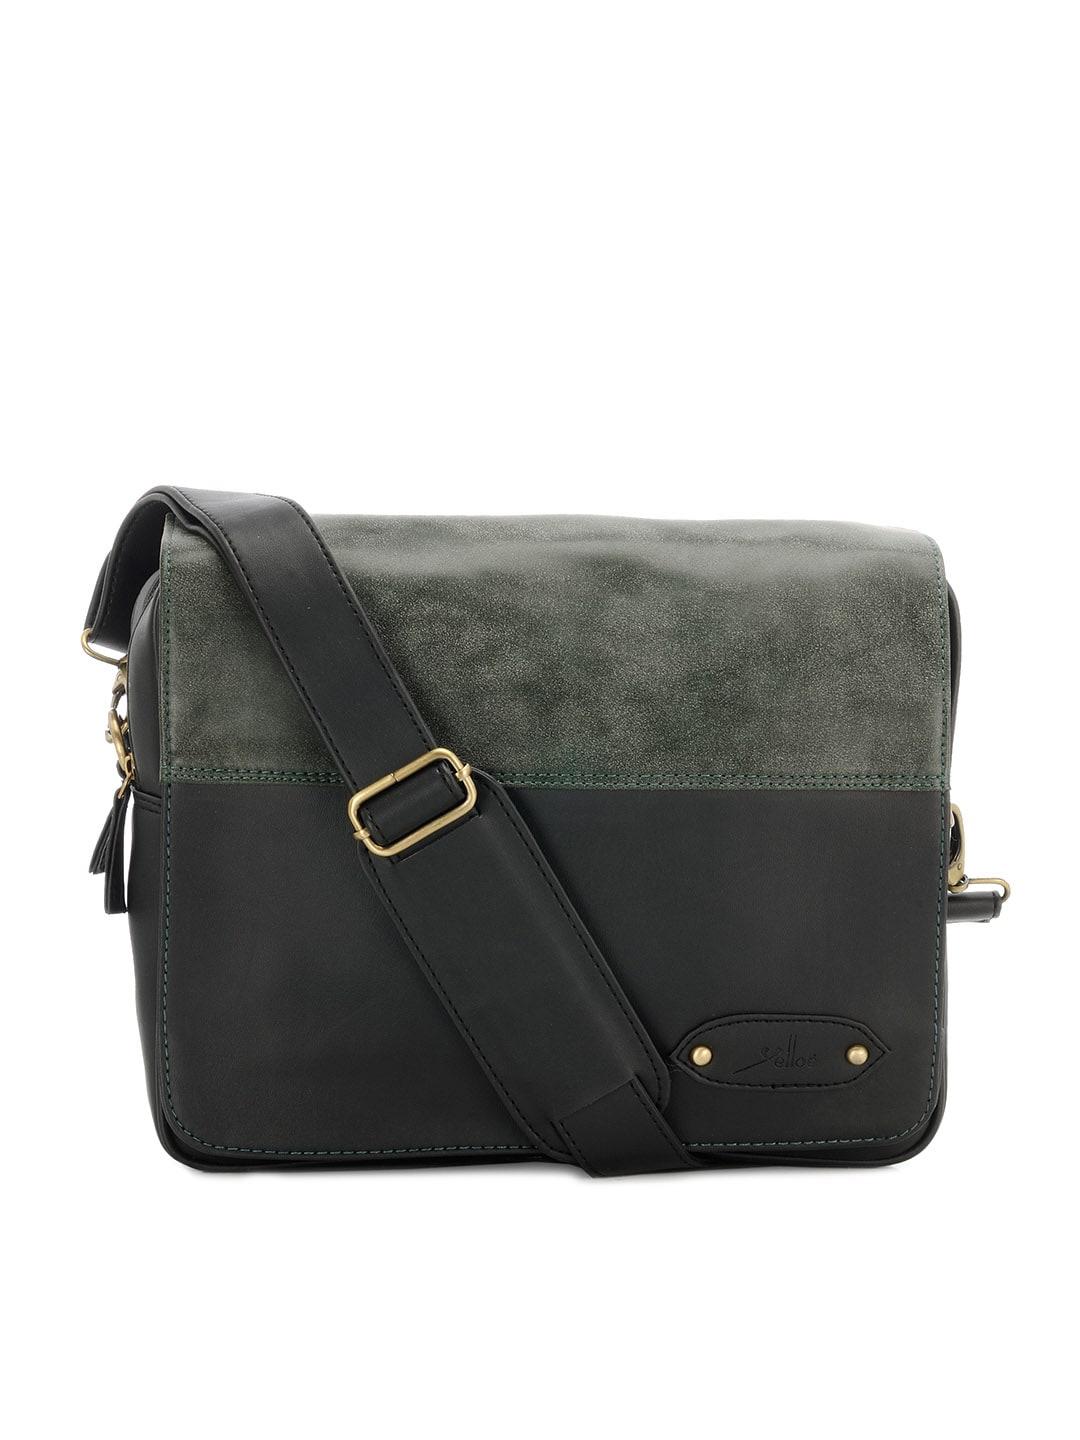 Messenger Bags - Buy Messenger Bags Online in India   Myntra 340b17d6e4